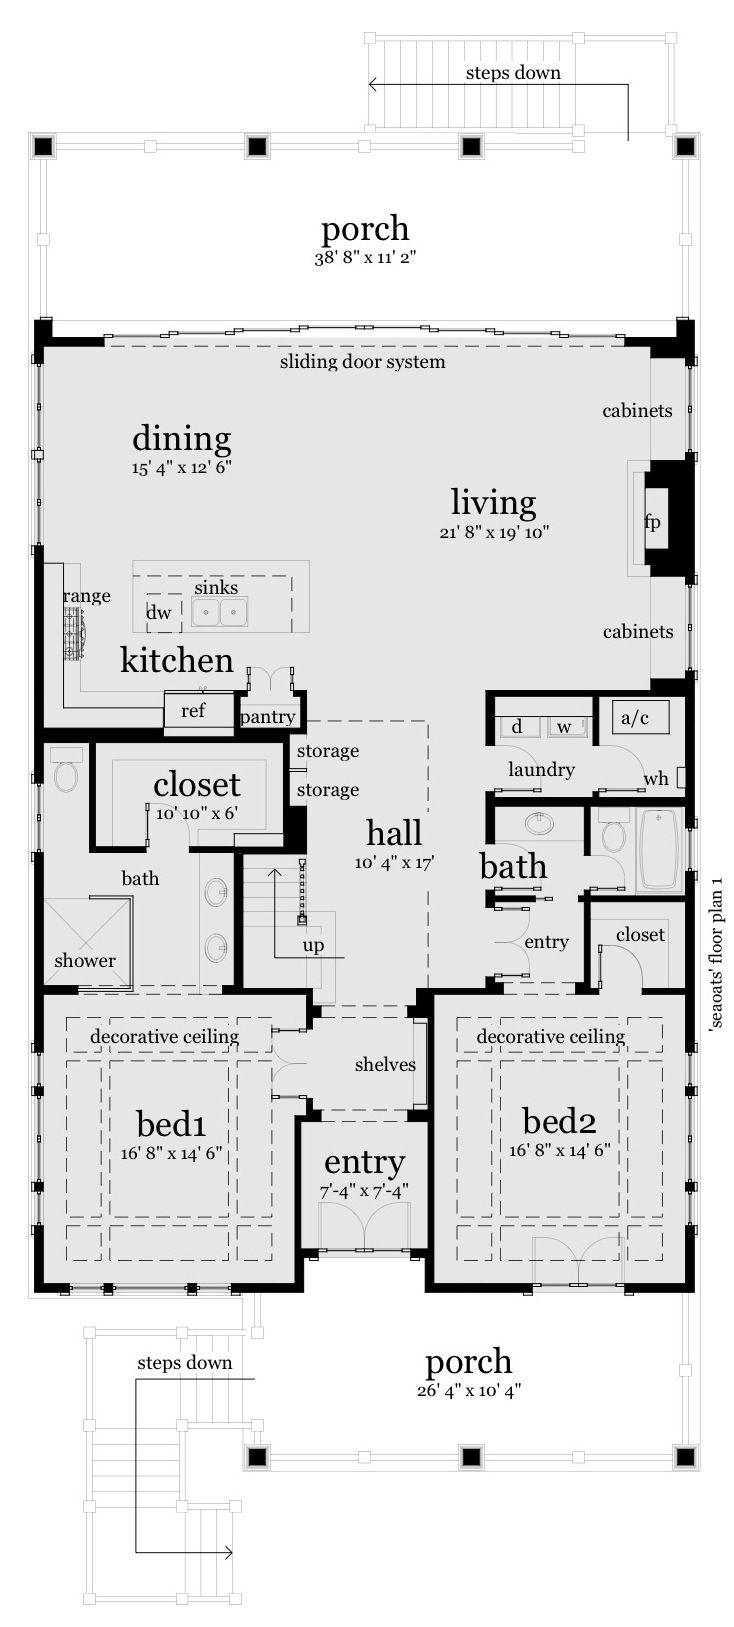 Beach style house plan 3 beds 3 baths 2621 sqft plan 64